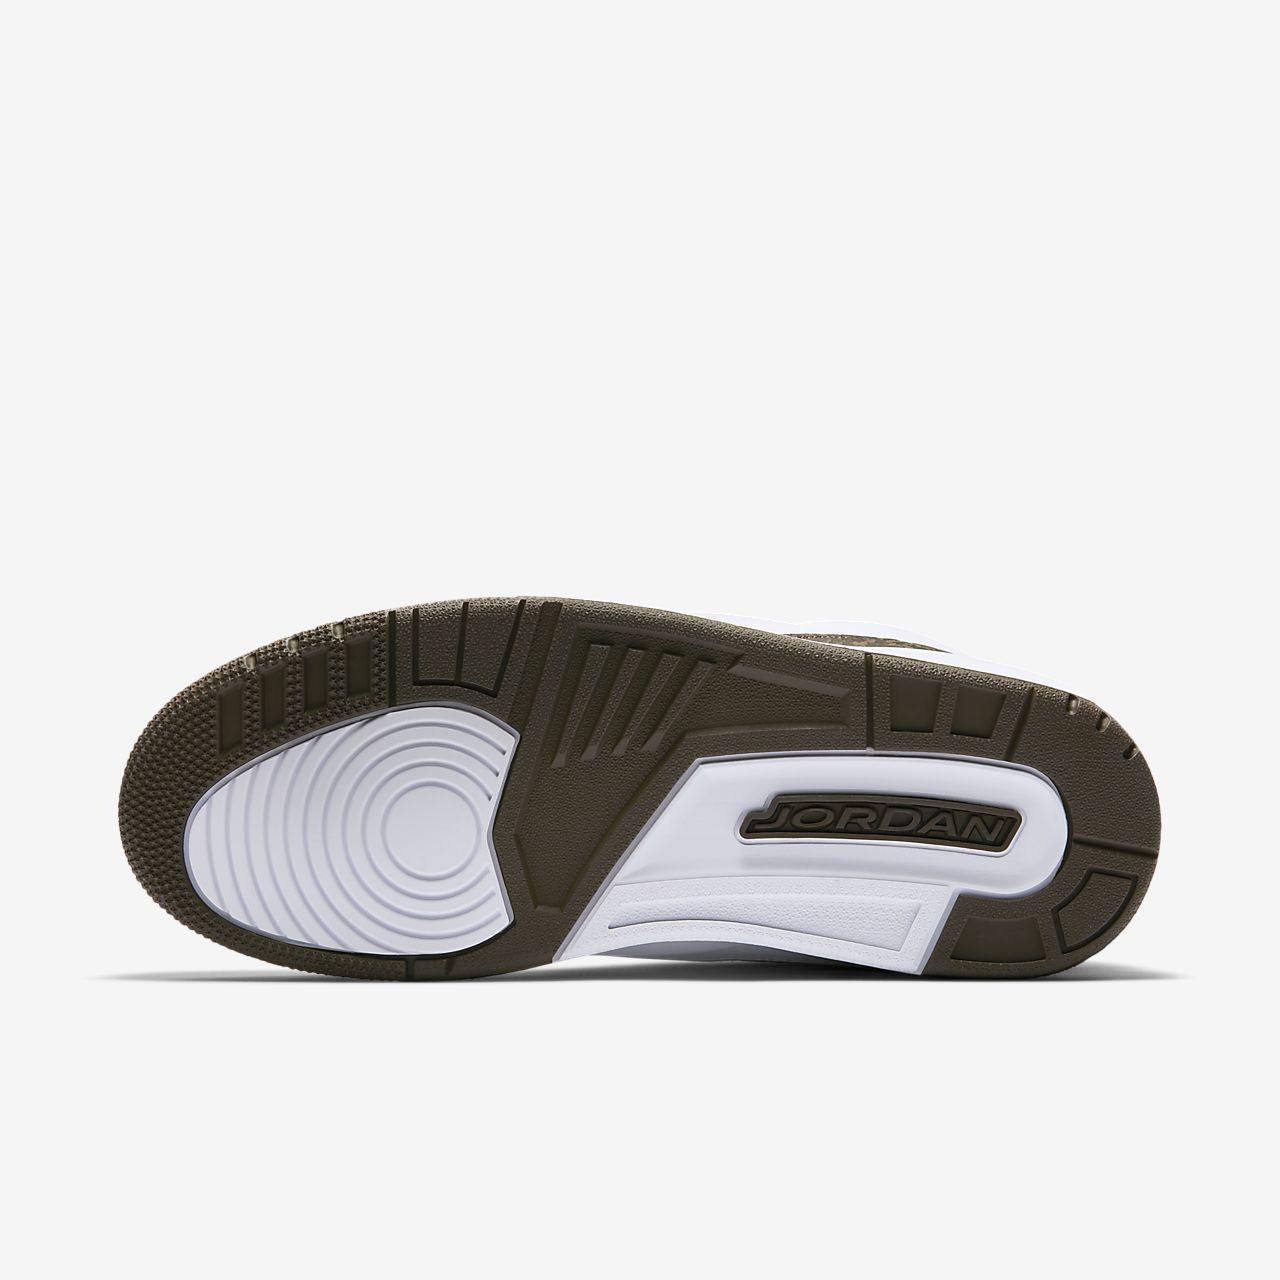 5b96eaea791ec6 Air Jordan 3 Retro Men s Shoe. Nike.com